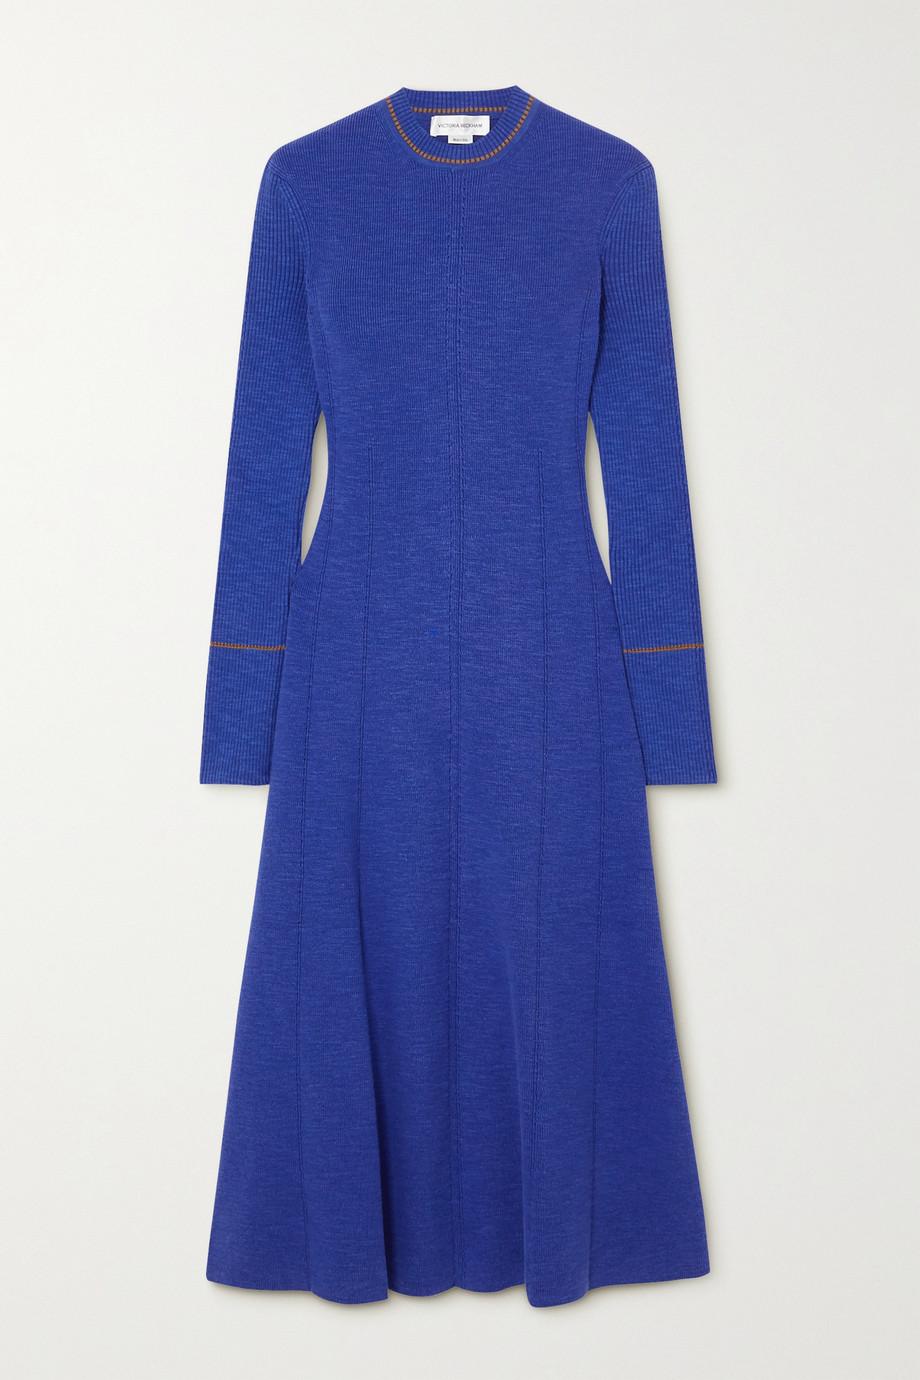 Victoria Beckham Ribbed cotton-blend midi dress